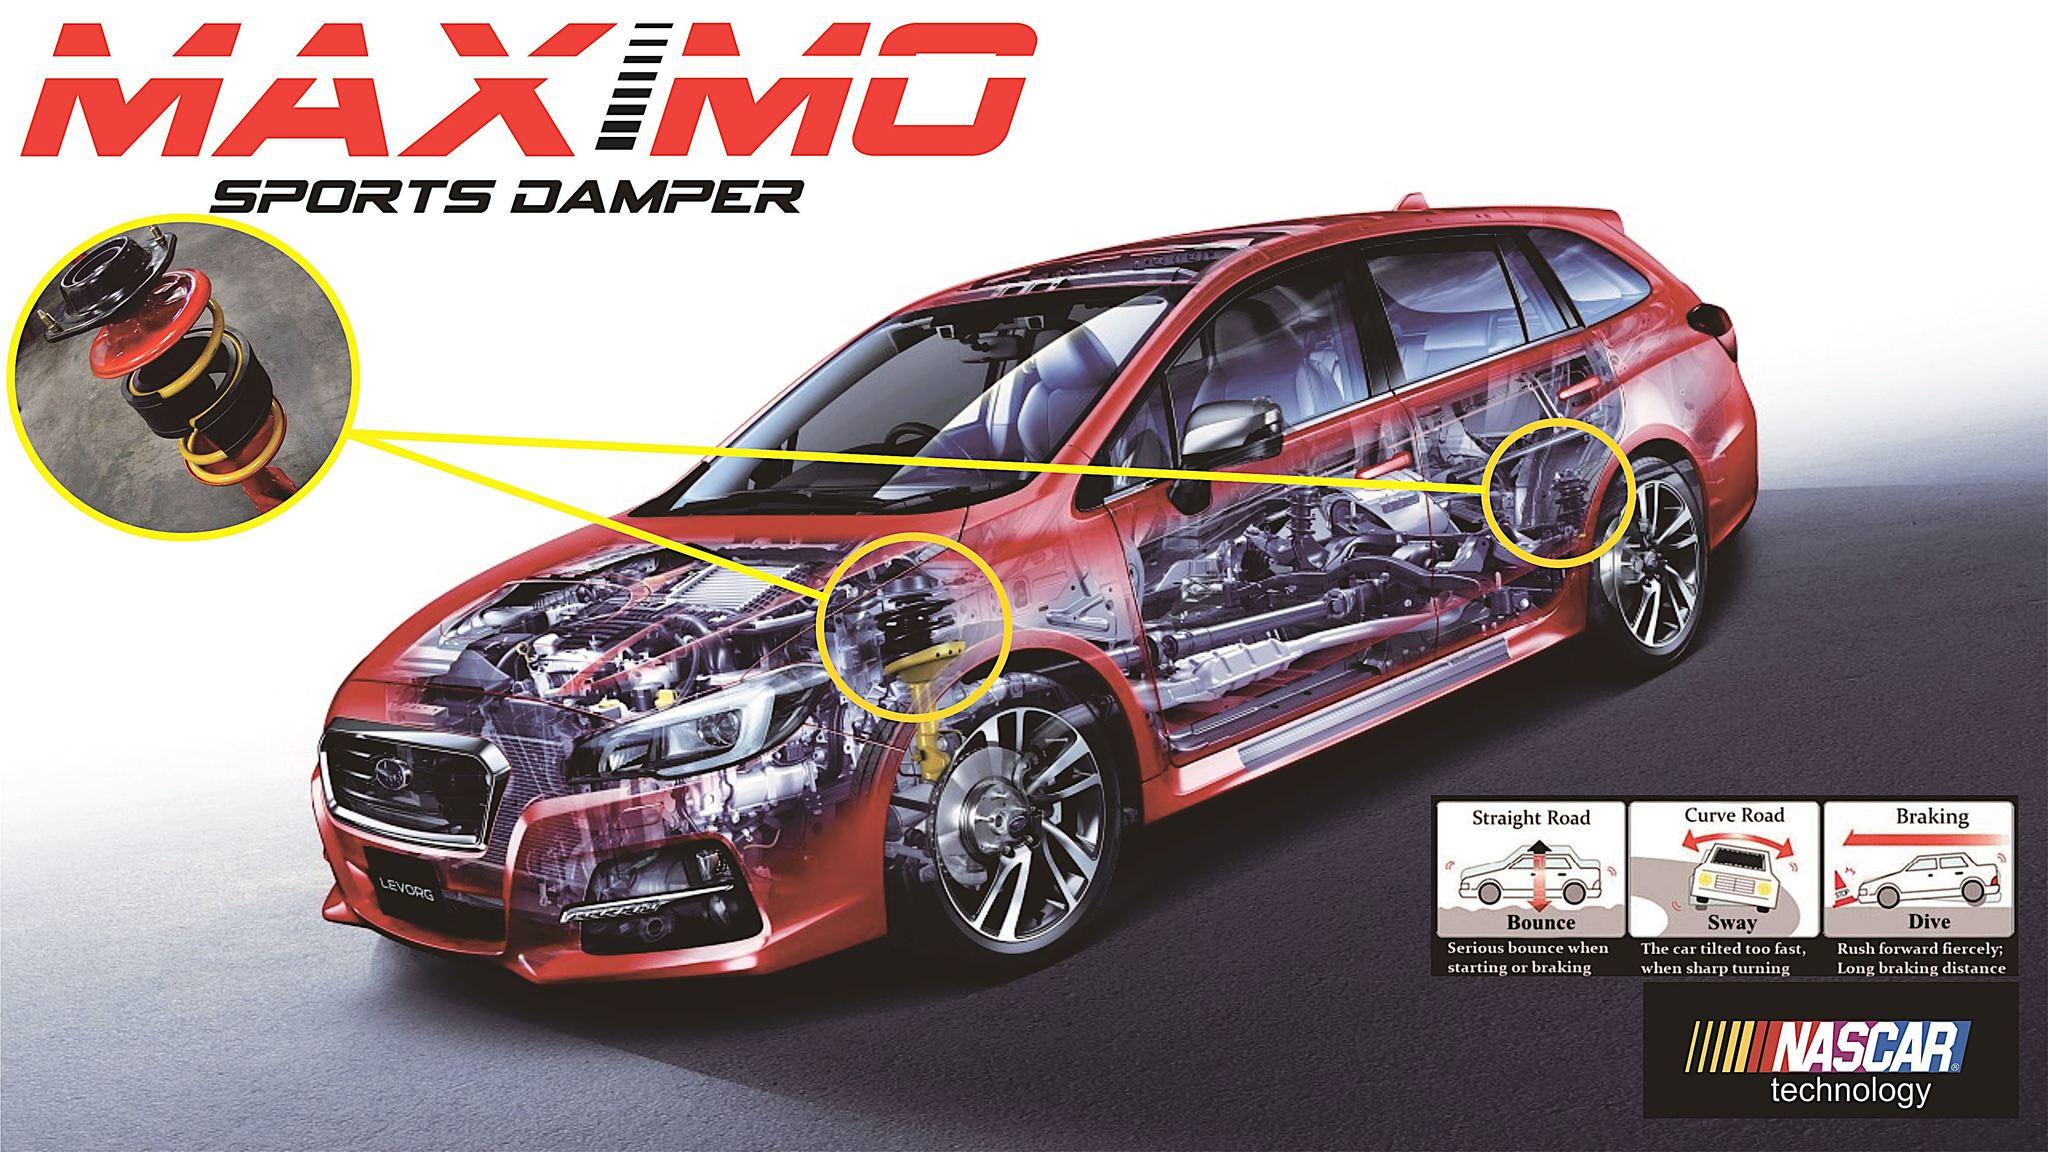 Spring Buffer/Stabilizer/Maximo Sports Damper Honda Jazz RS (belakang)